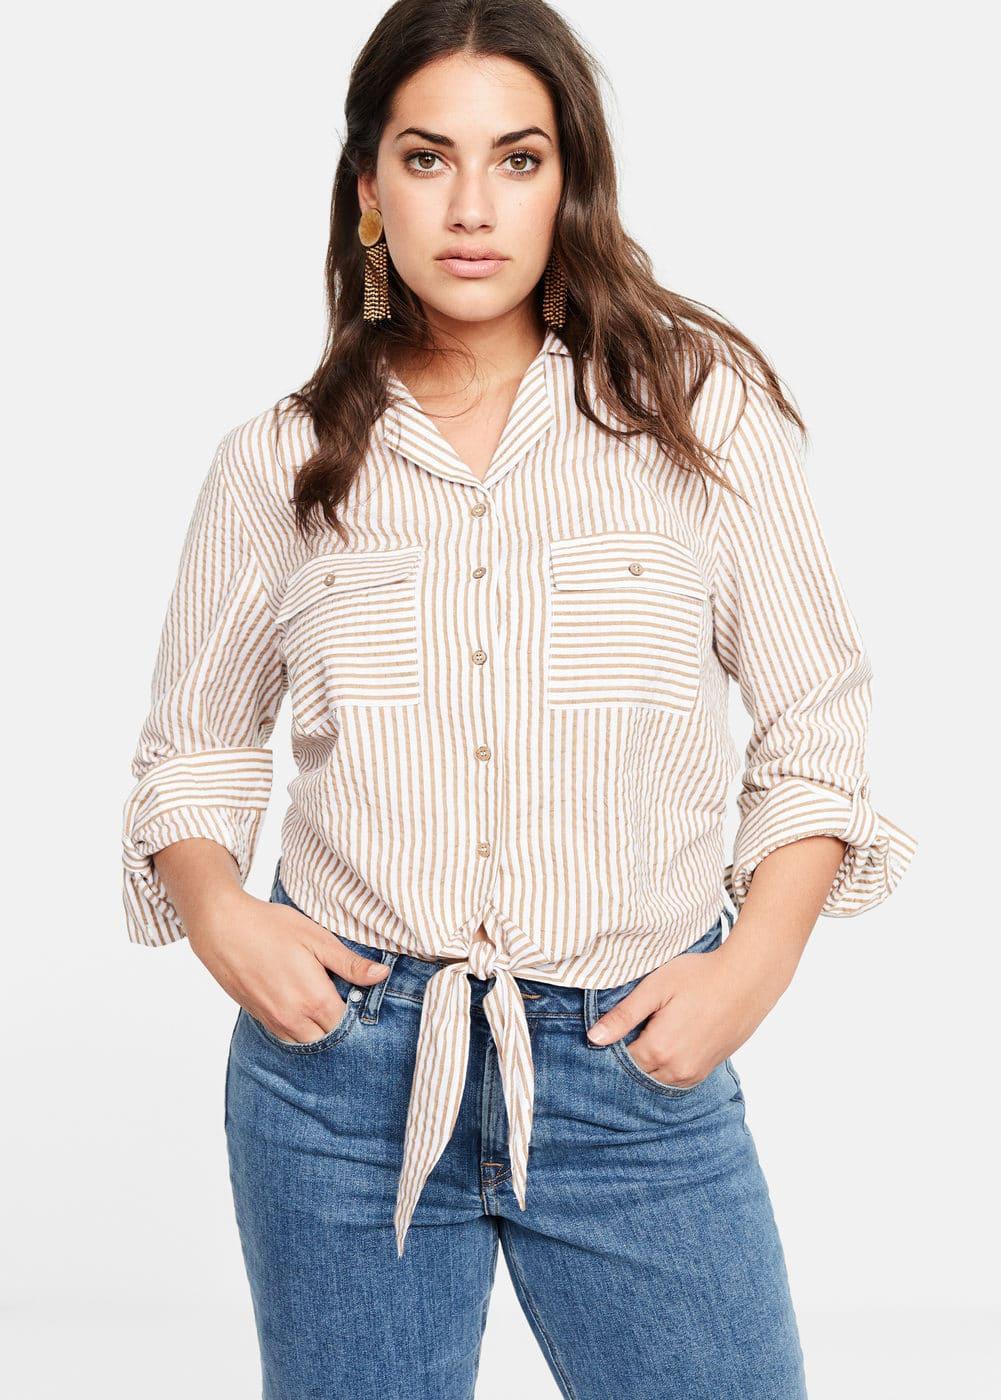 Mango - Jeans straight Theresa - 4